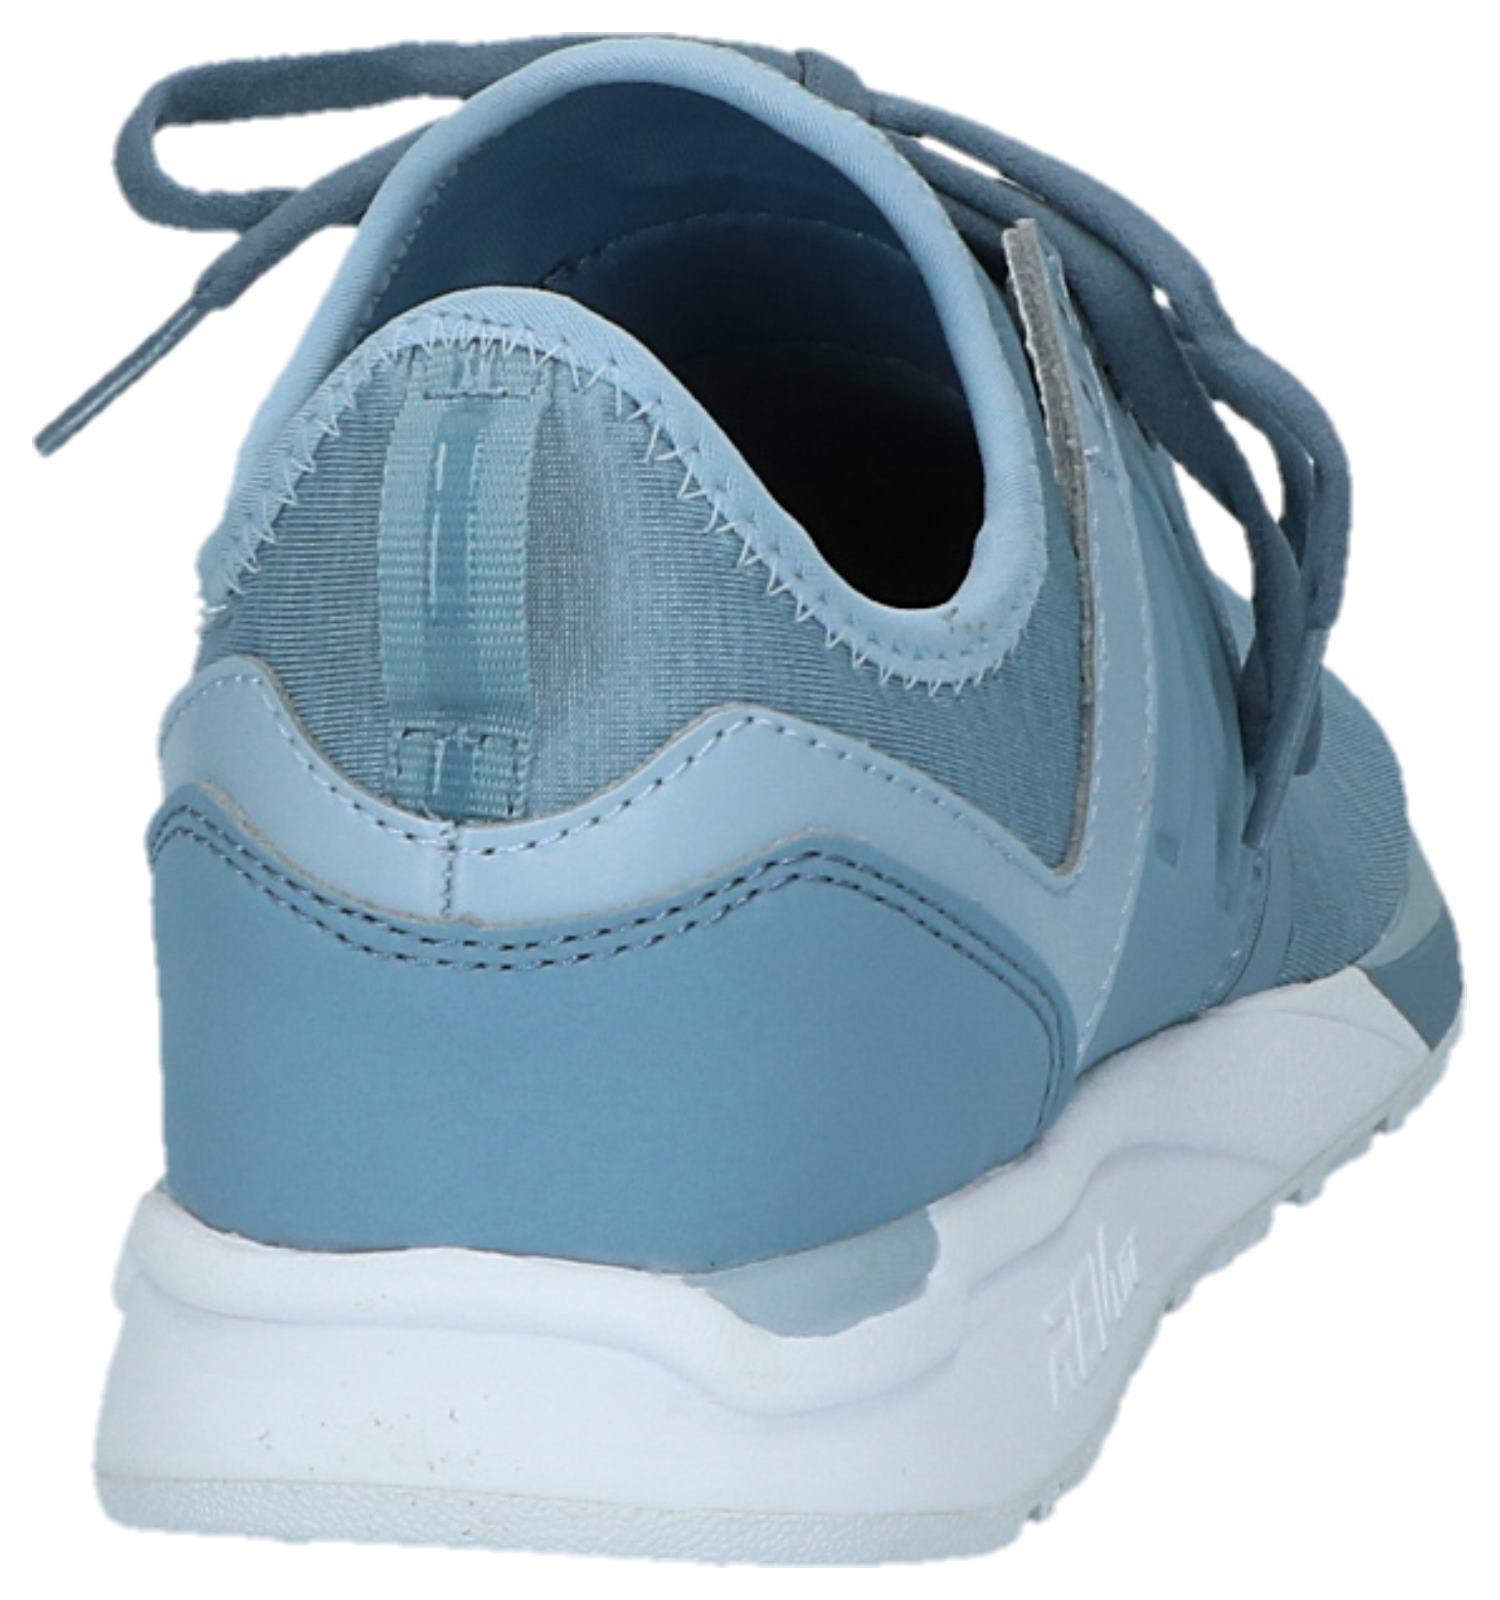 New New Blauwe Balance Wrl247 Sneakers Balance Wrl247 Blauwe 1cFTl3KJ